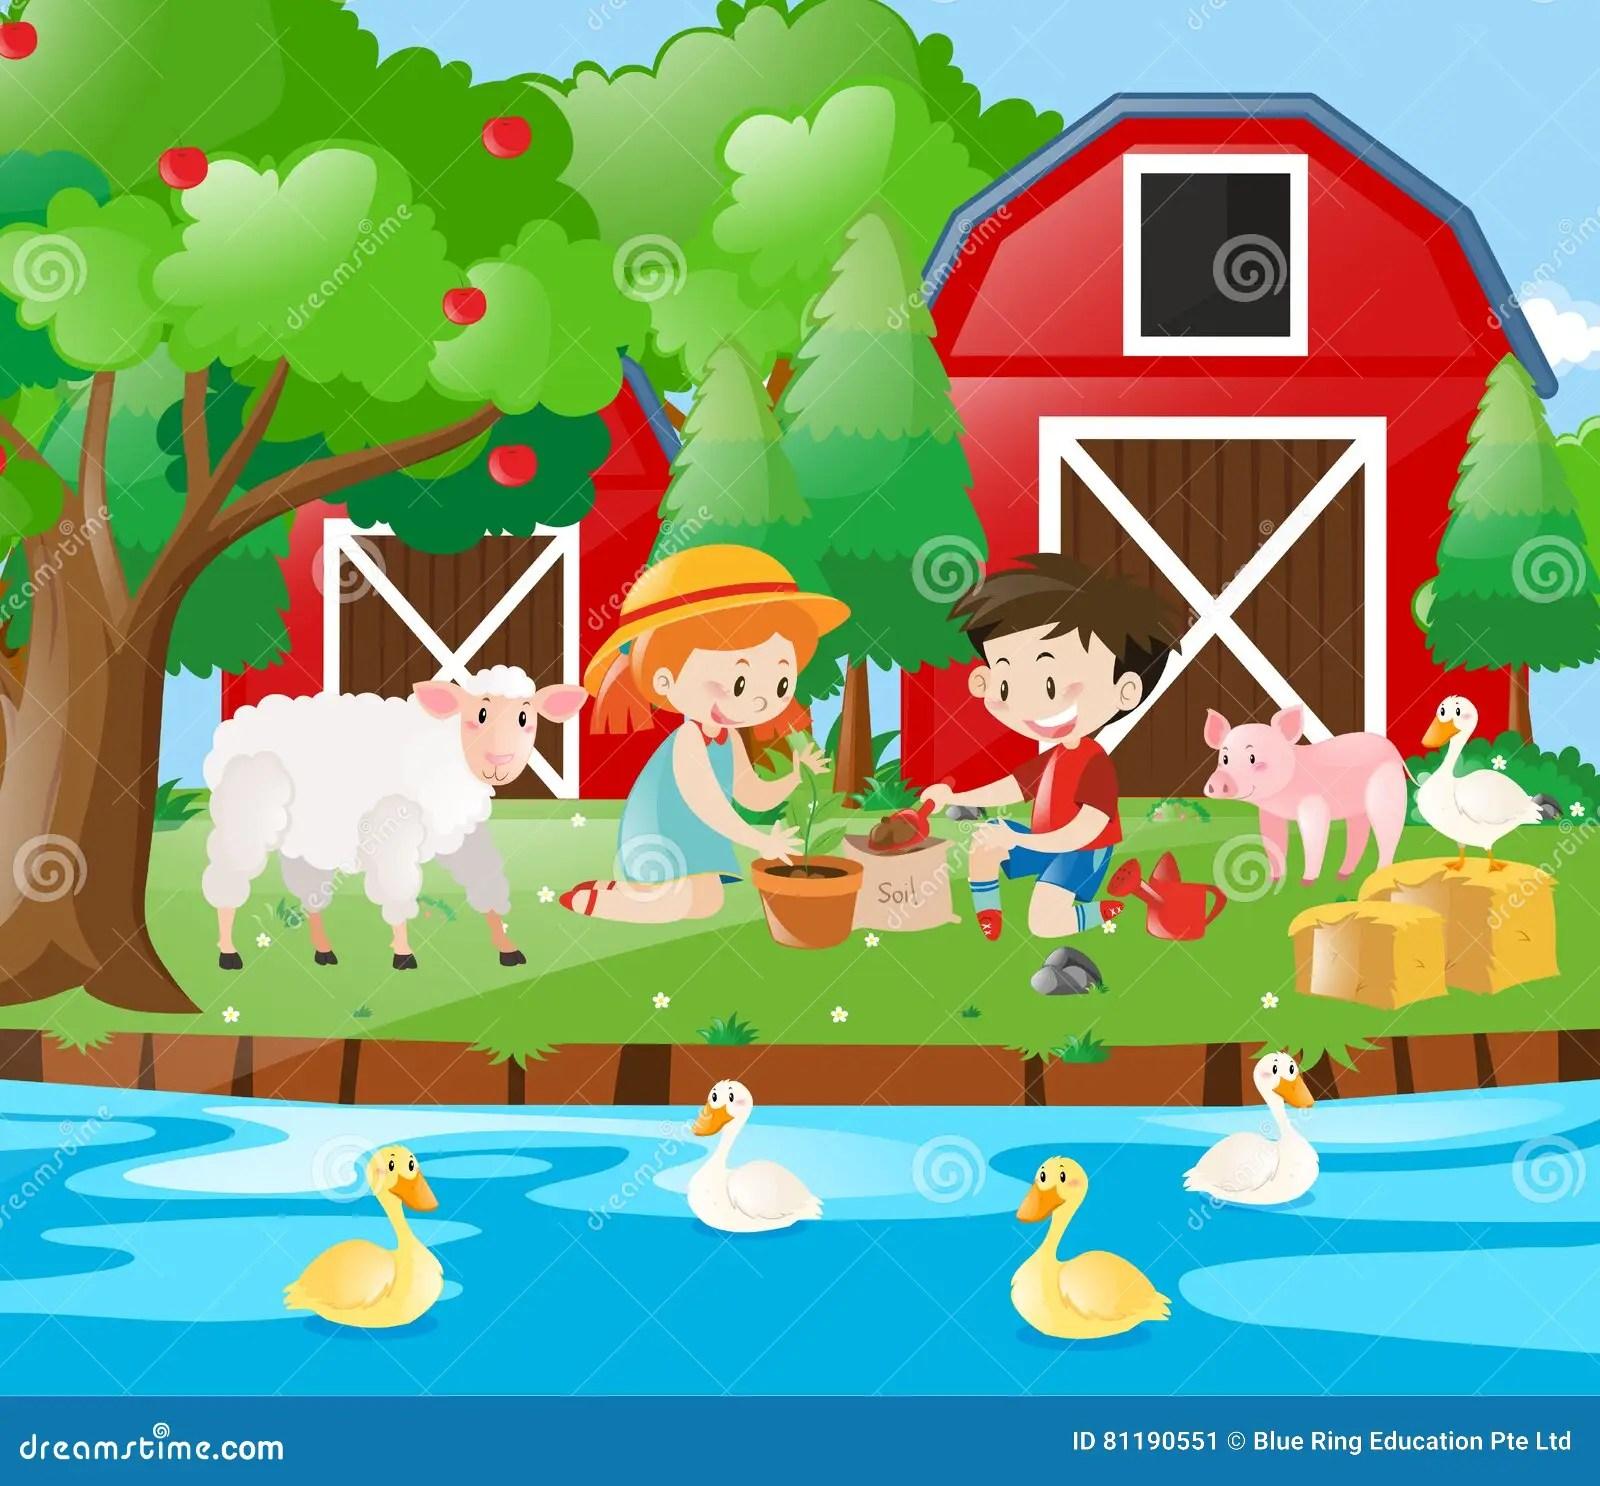 hight resolution of farm scene with kids planting tree